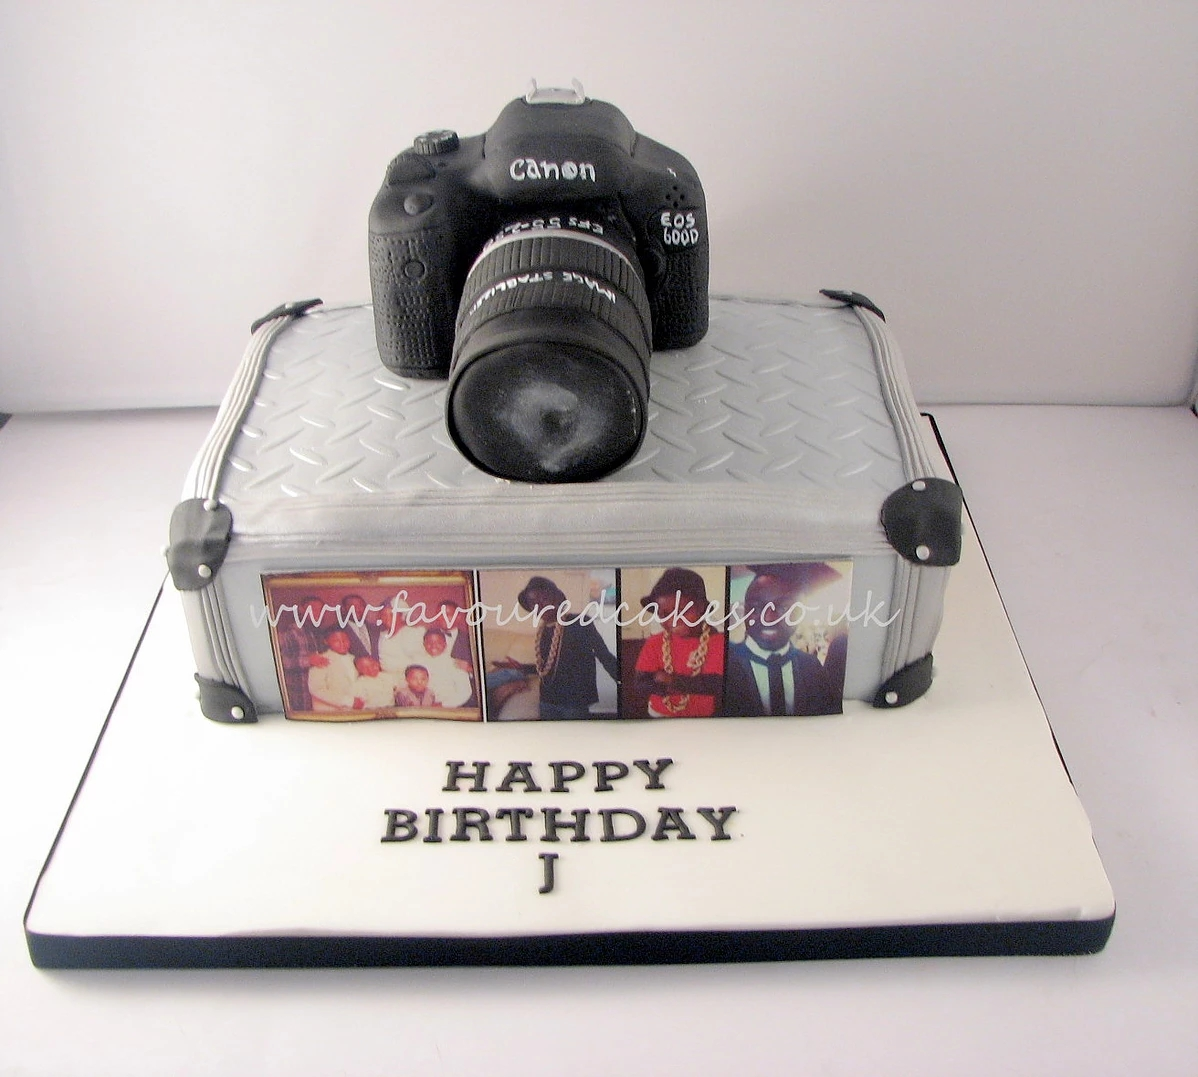 Camera & Camera Box Cake CB01